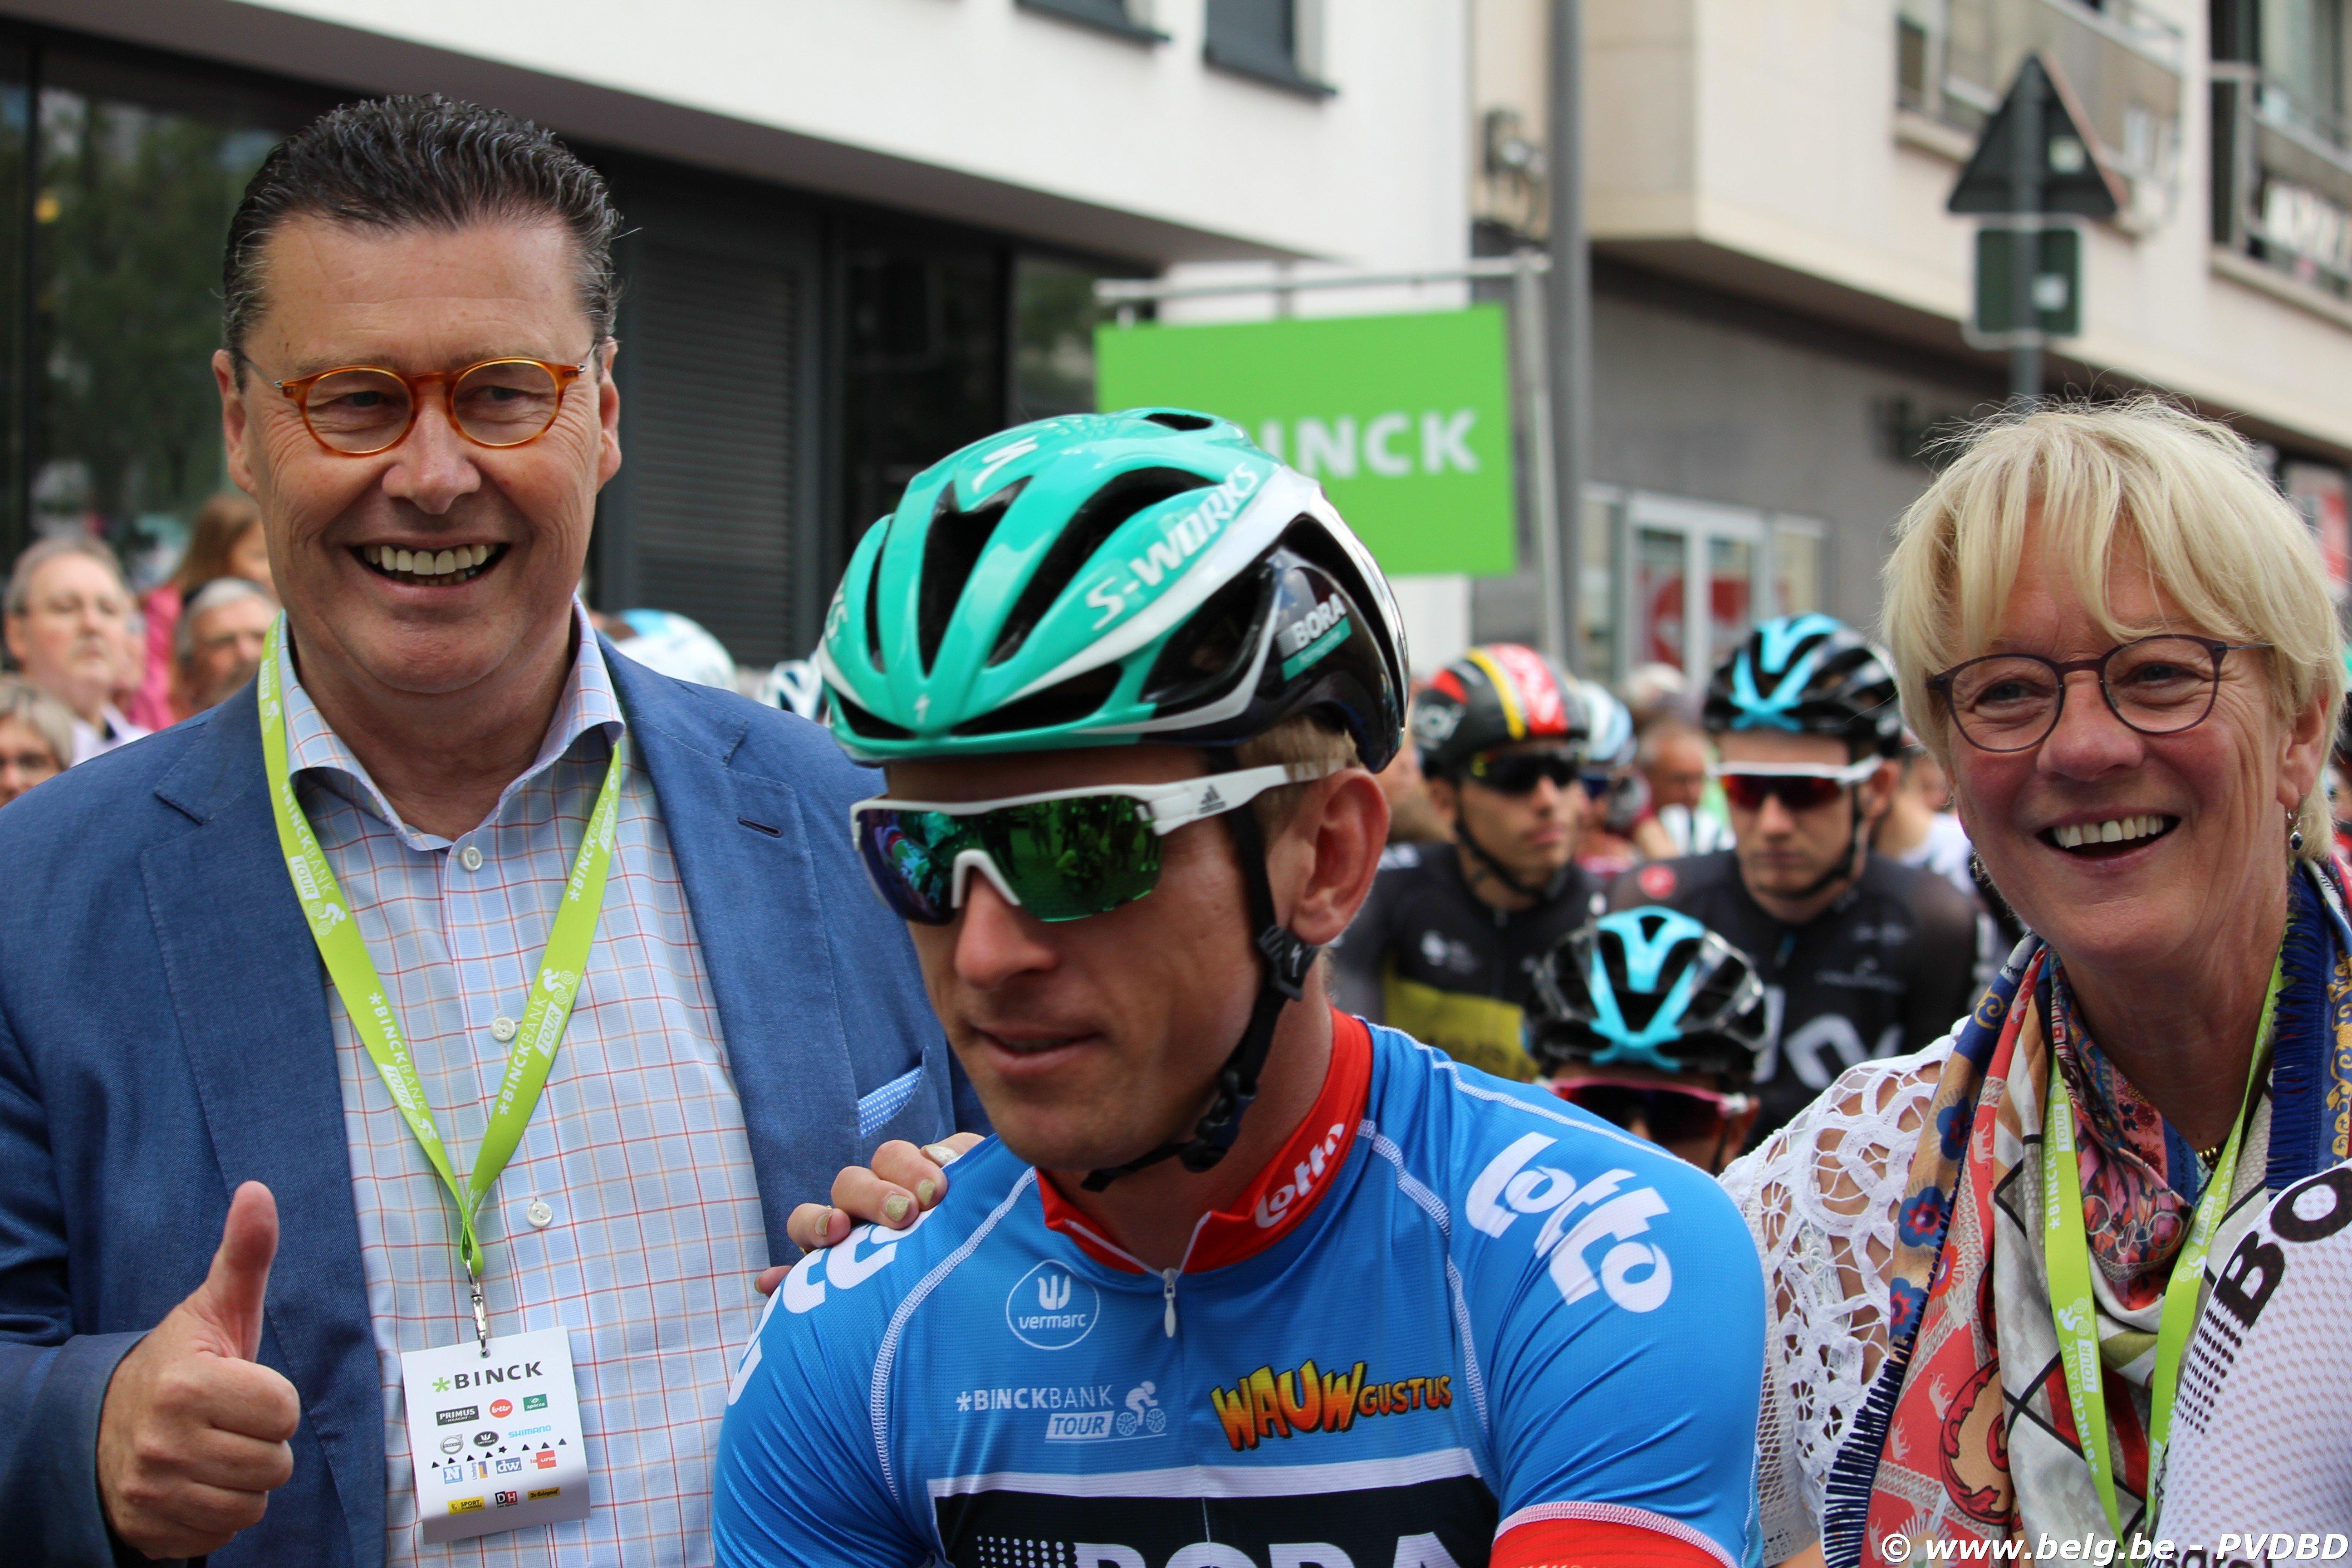 Binckbank Tour van start in Blankenberge - IMG 3043